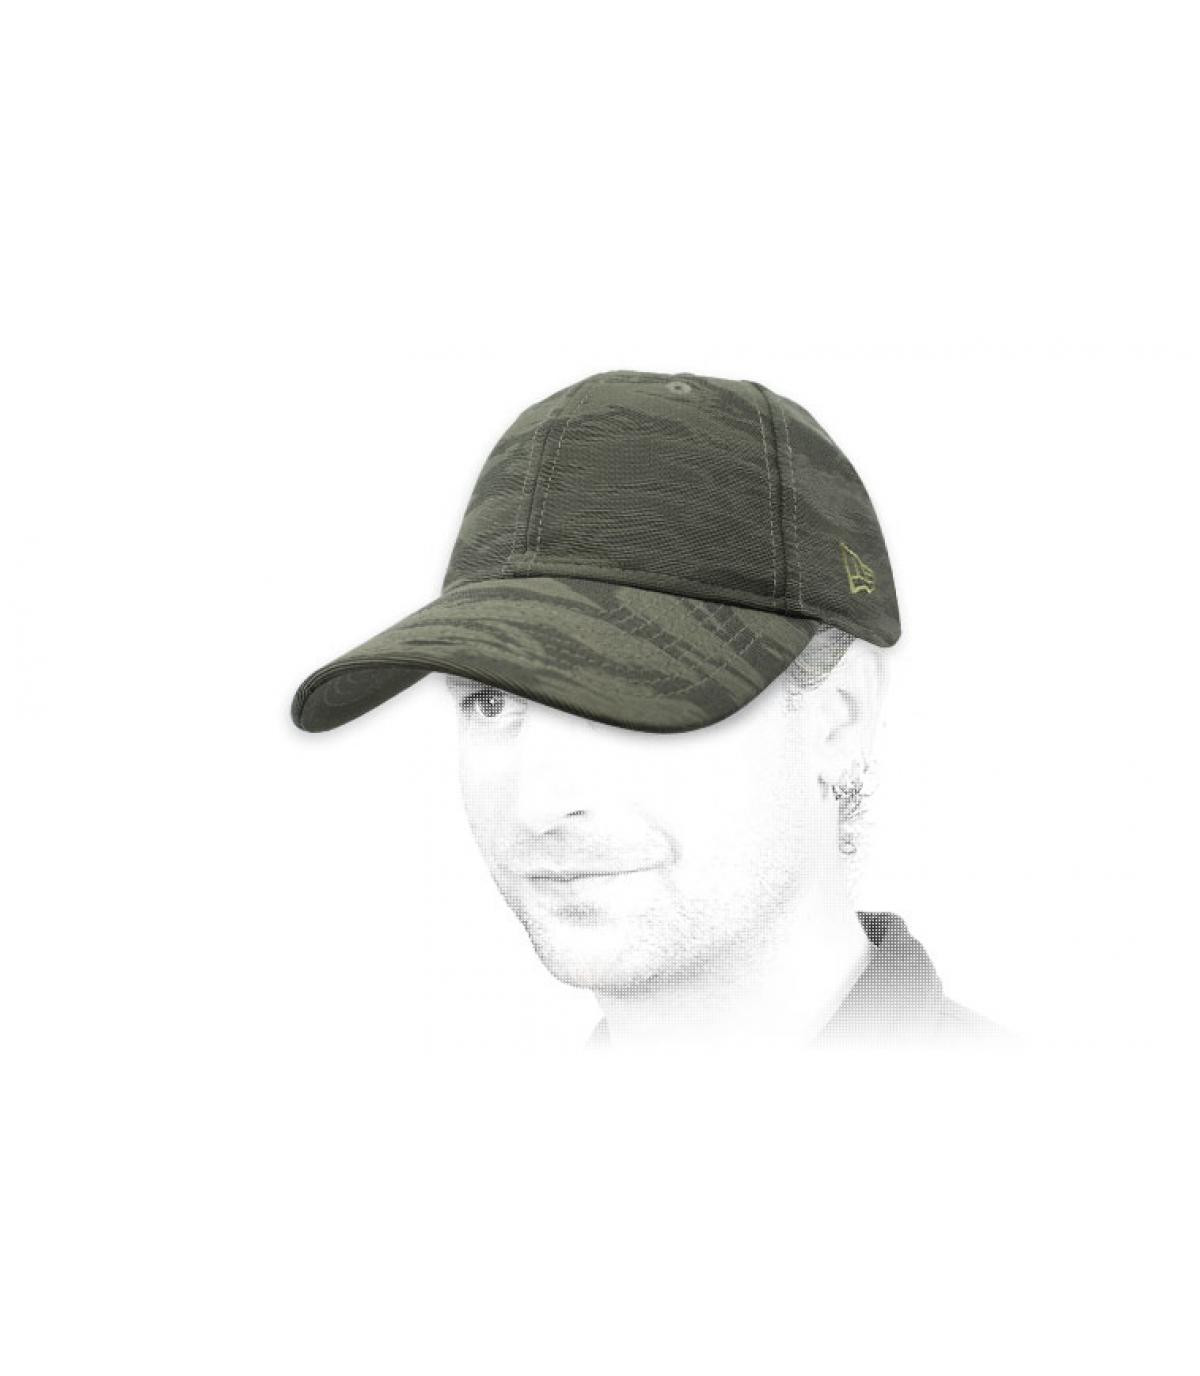 gorra New Era camo gris